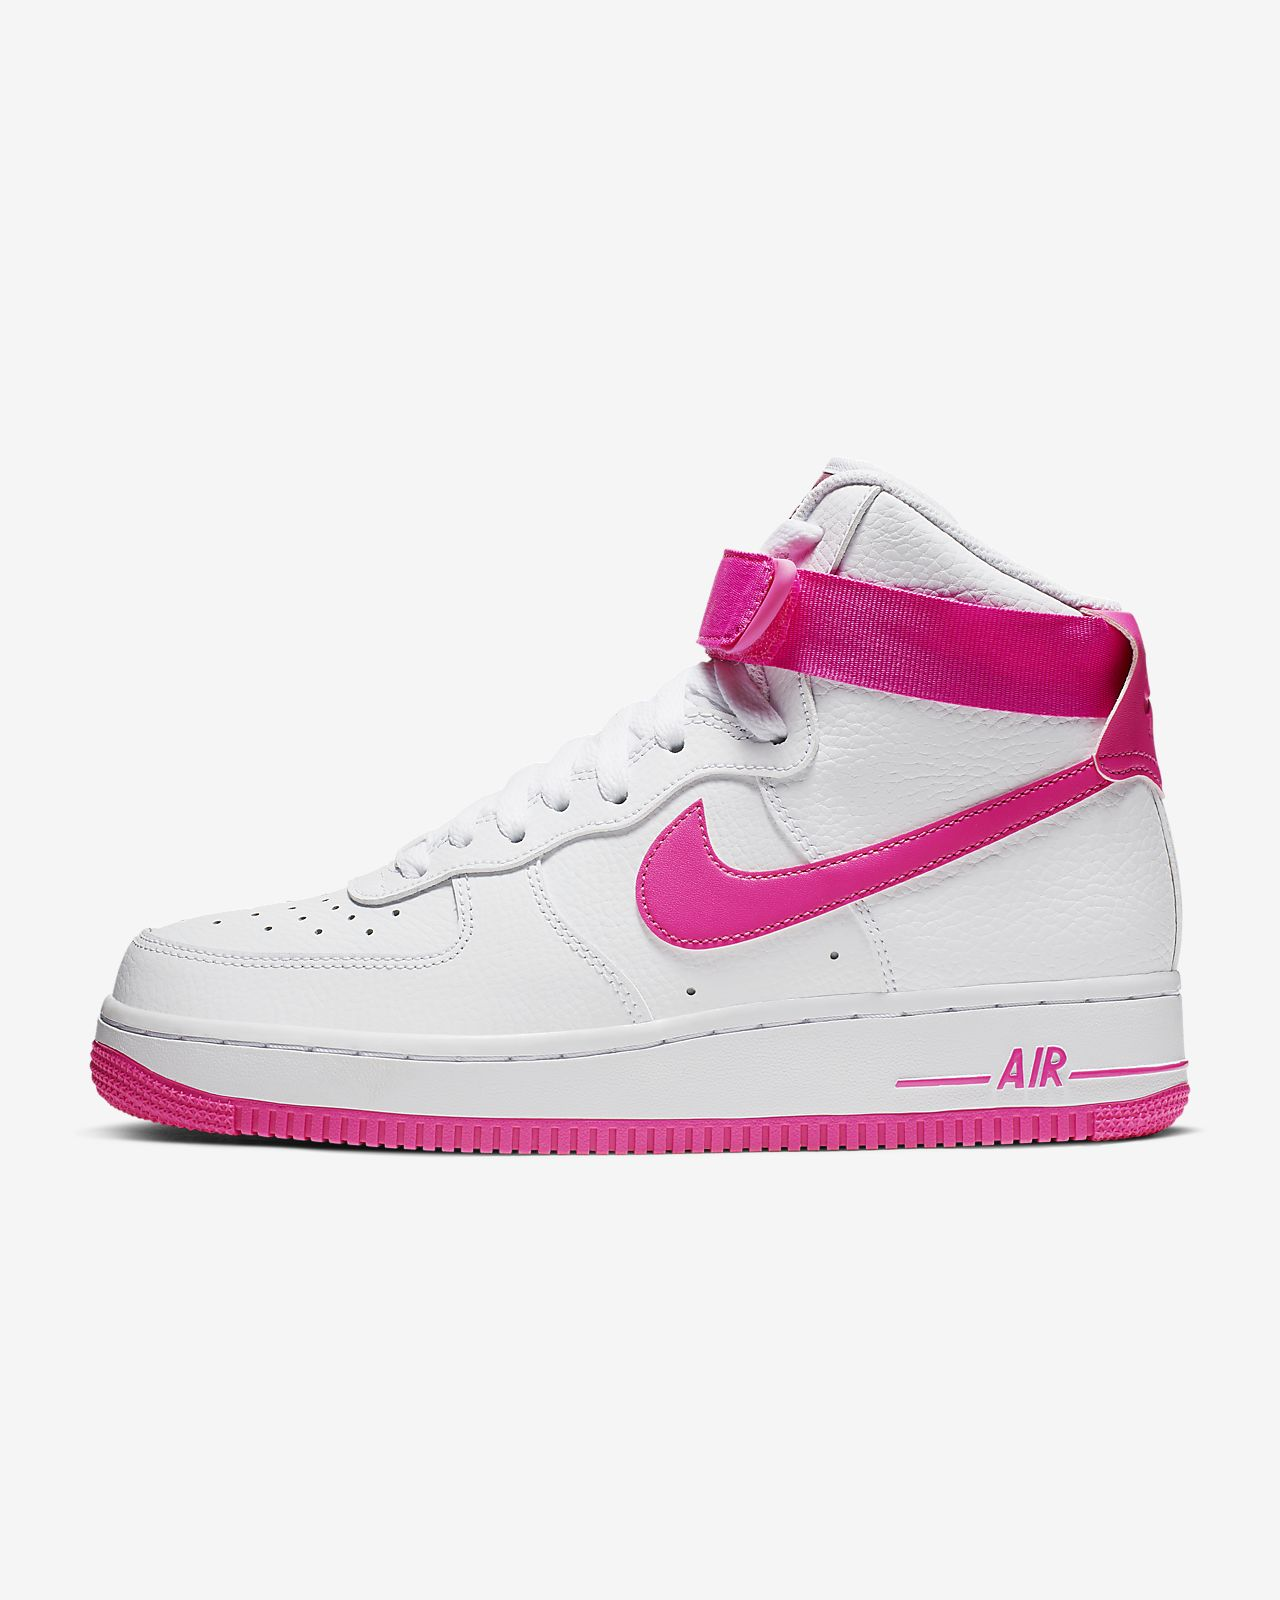 brand new 56f71 ecca7 Nike Air Force 1 High 08 LE-sko til kvinder. Nike.com DK